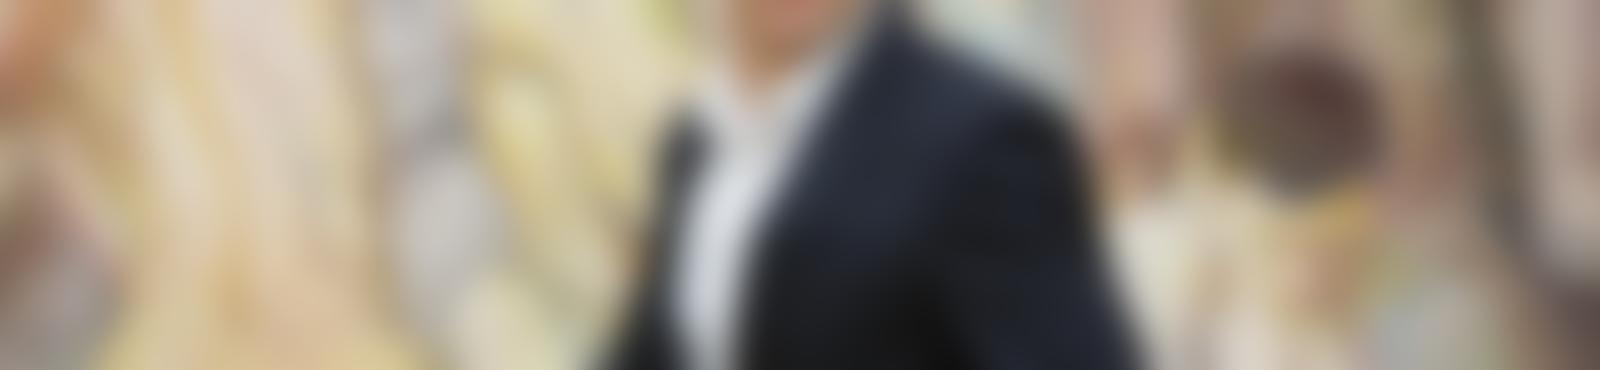 Blurred 7a7b3dce 404c 4913 9494 b04eb81d5caf